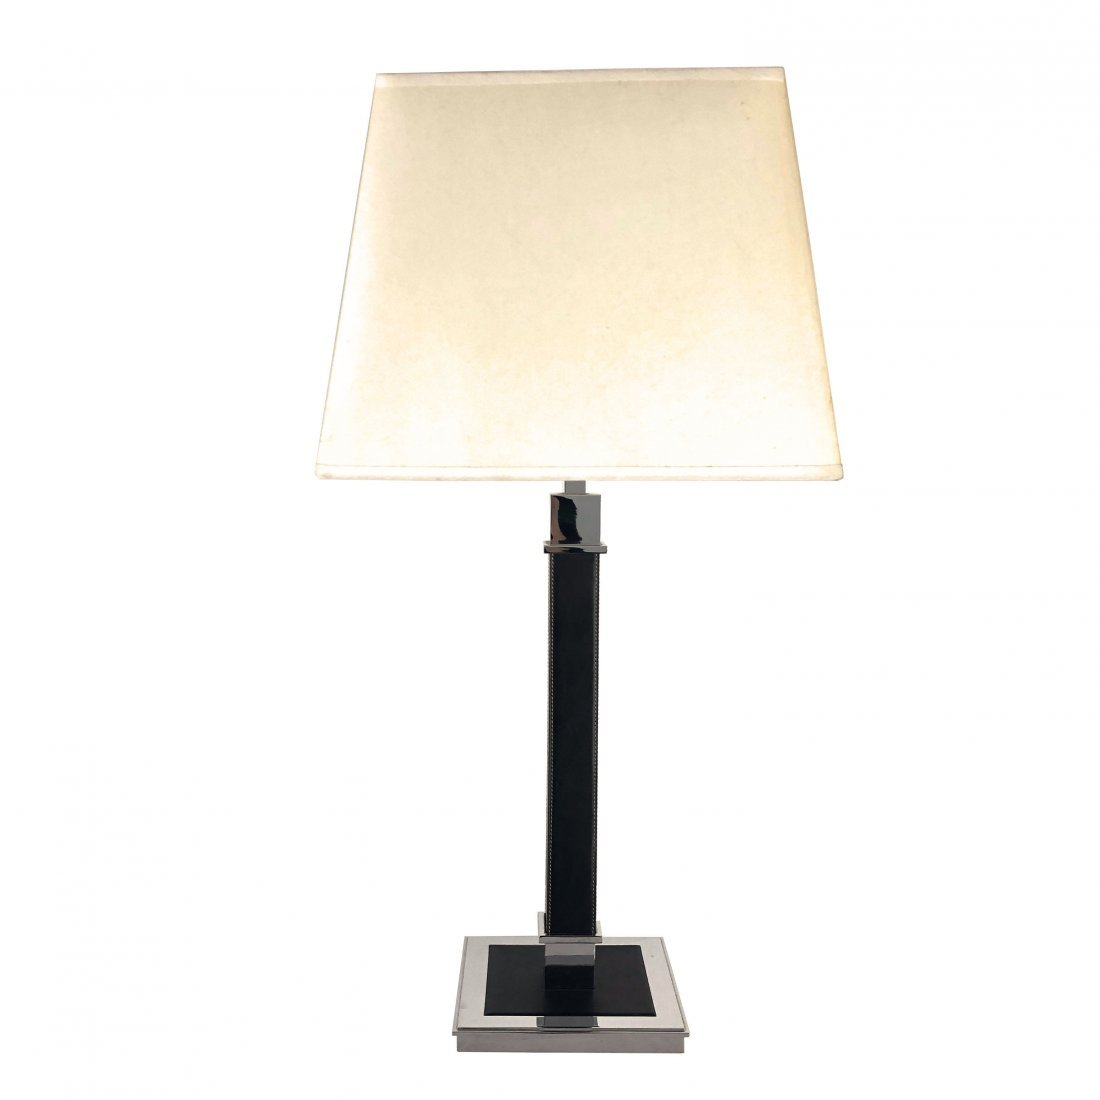 Ralph Lauren Polished Nickel Black Leather Table Lamp - 2